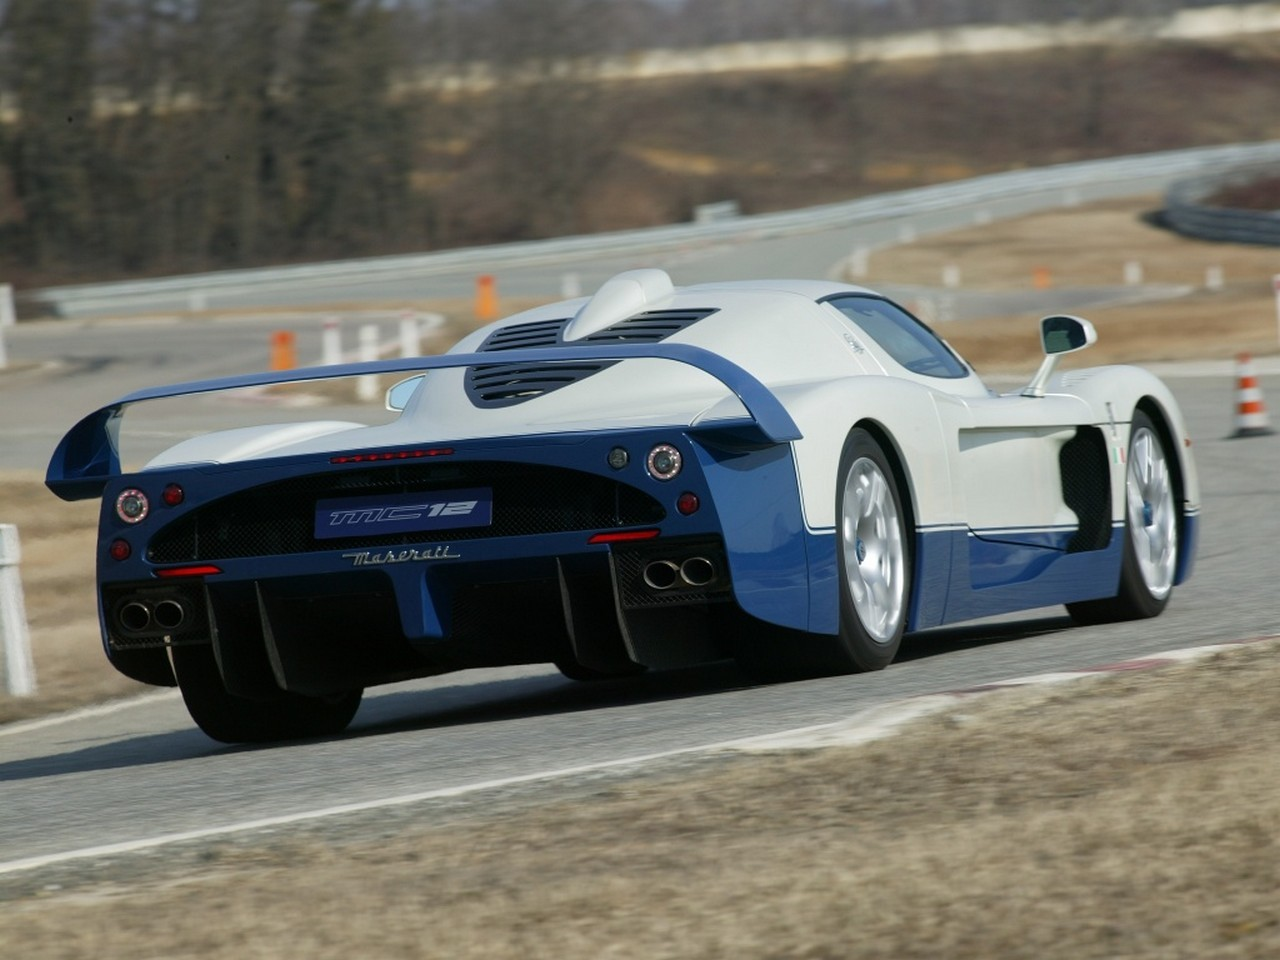 Maserati MC12 gallery autodacorsatargate